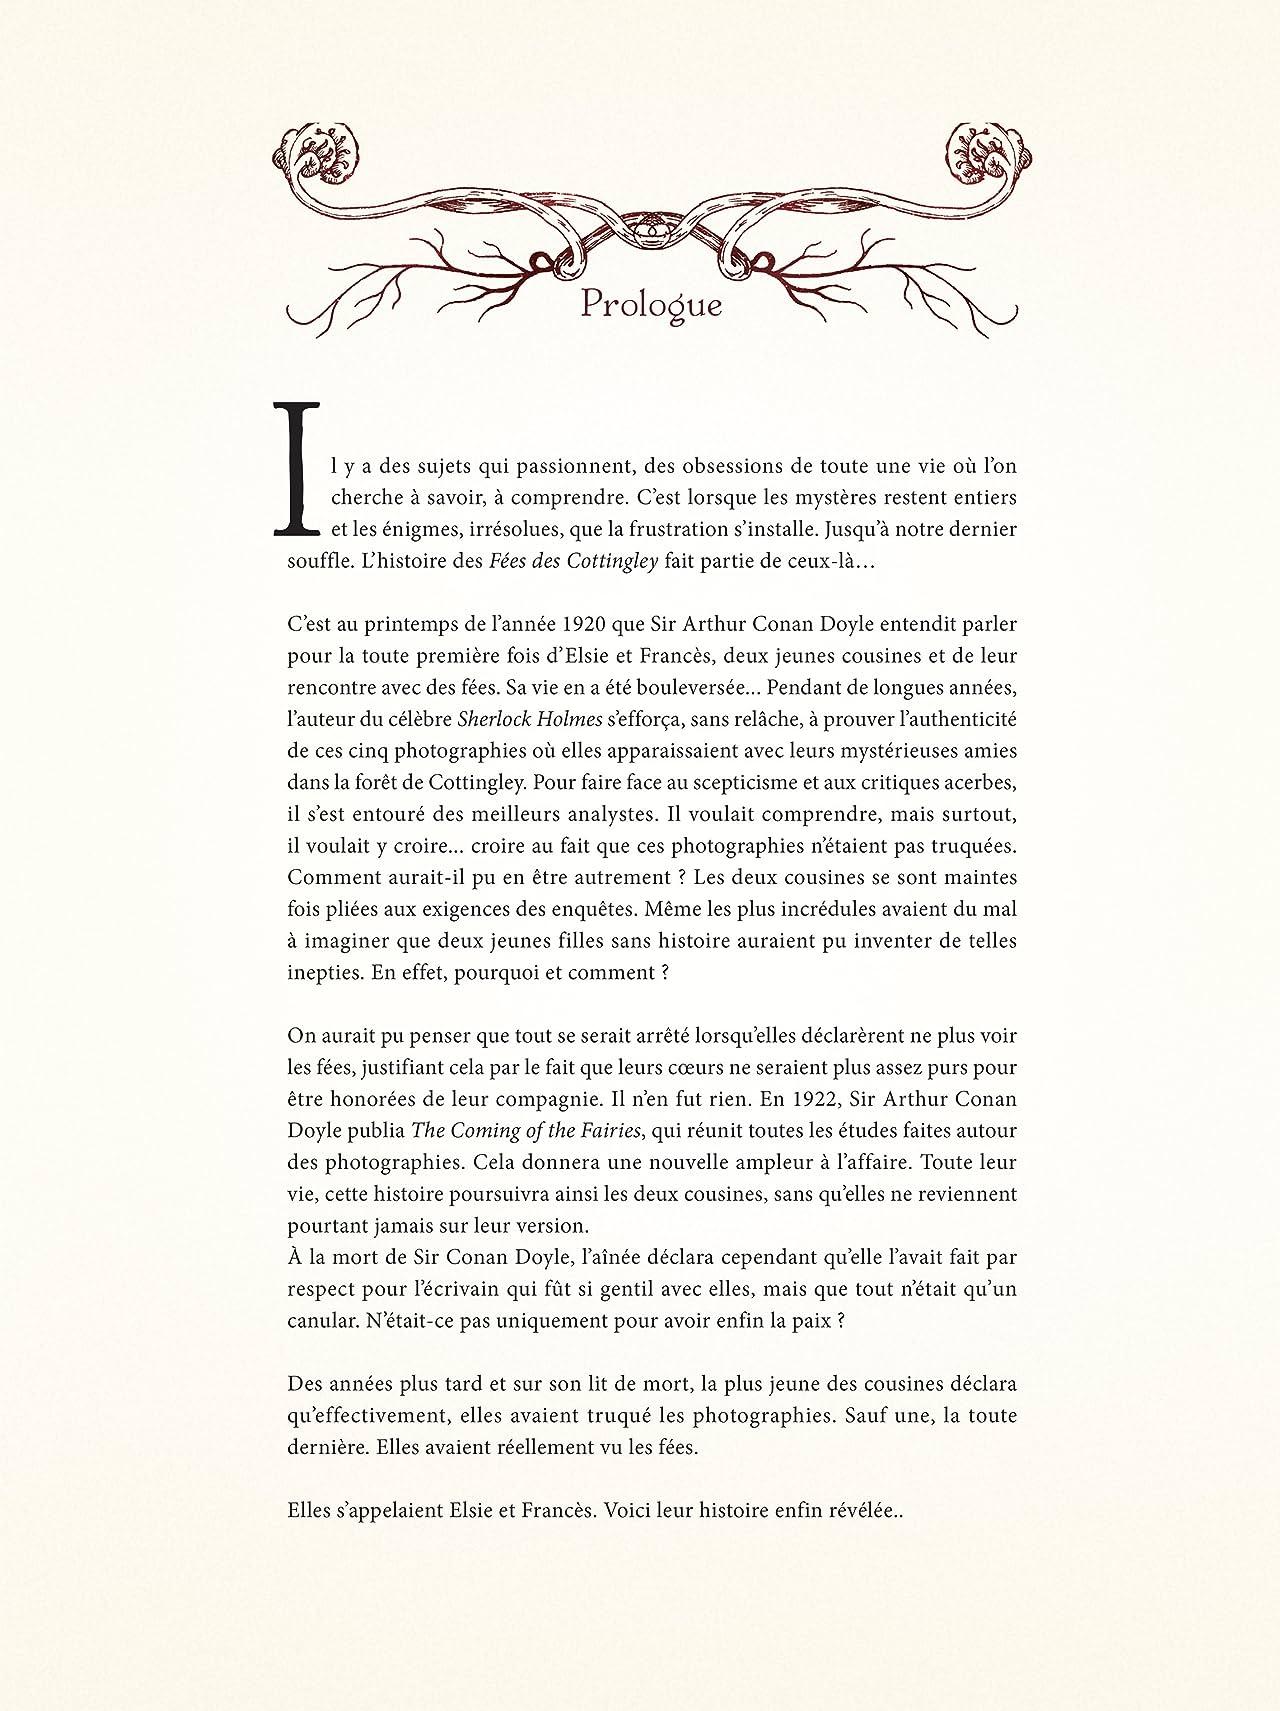 Les Fées de Cottingley Vol. 1